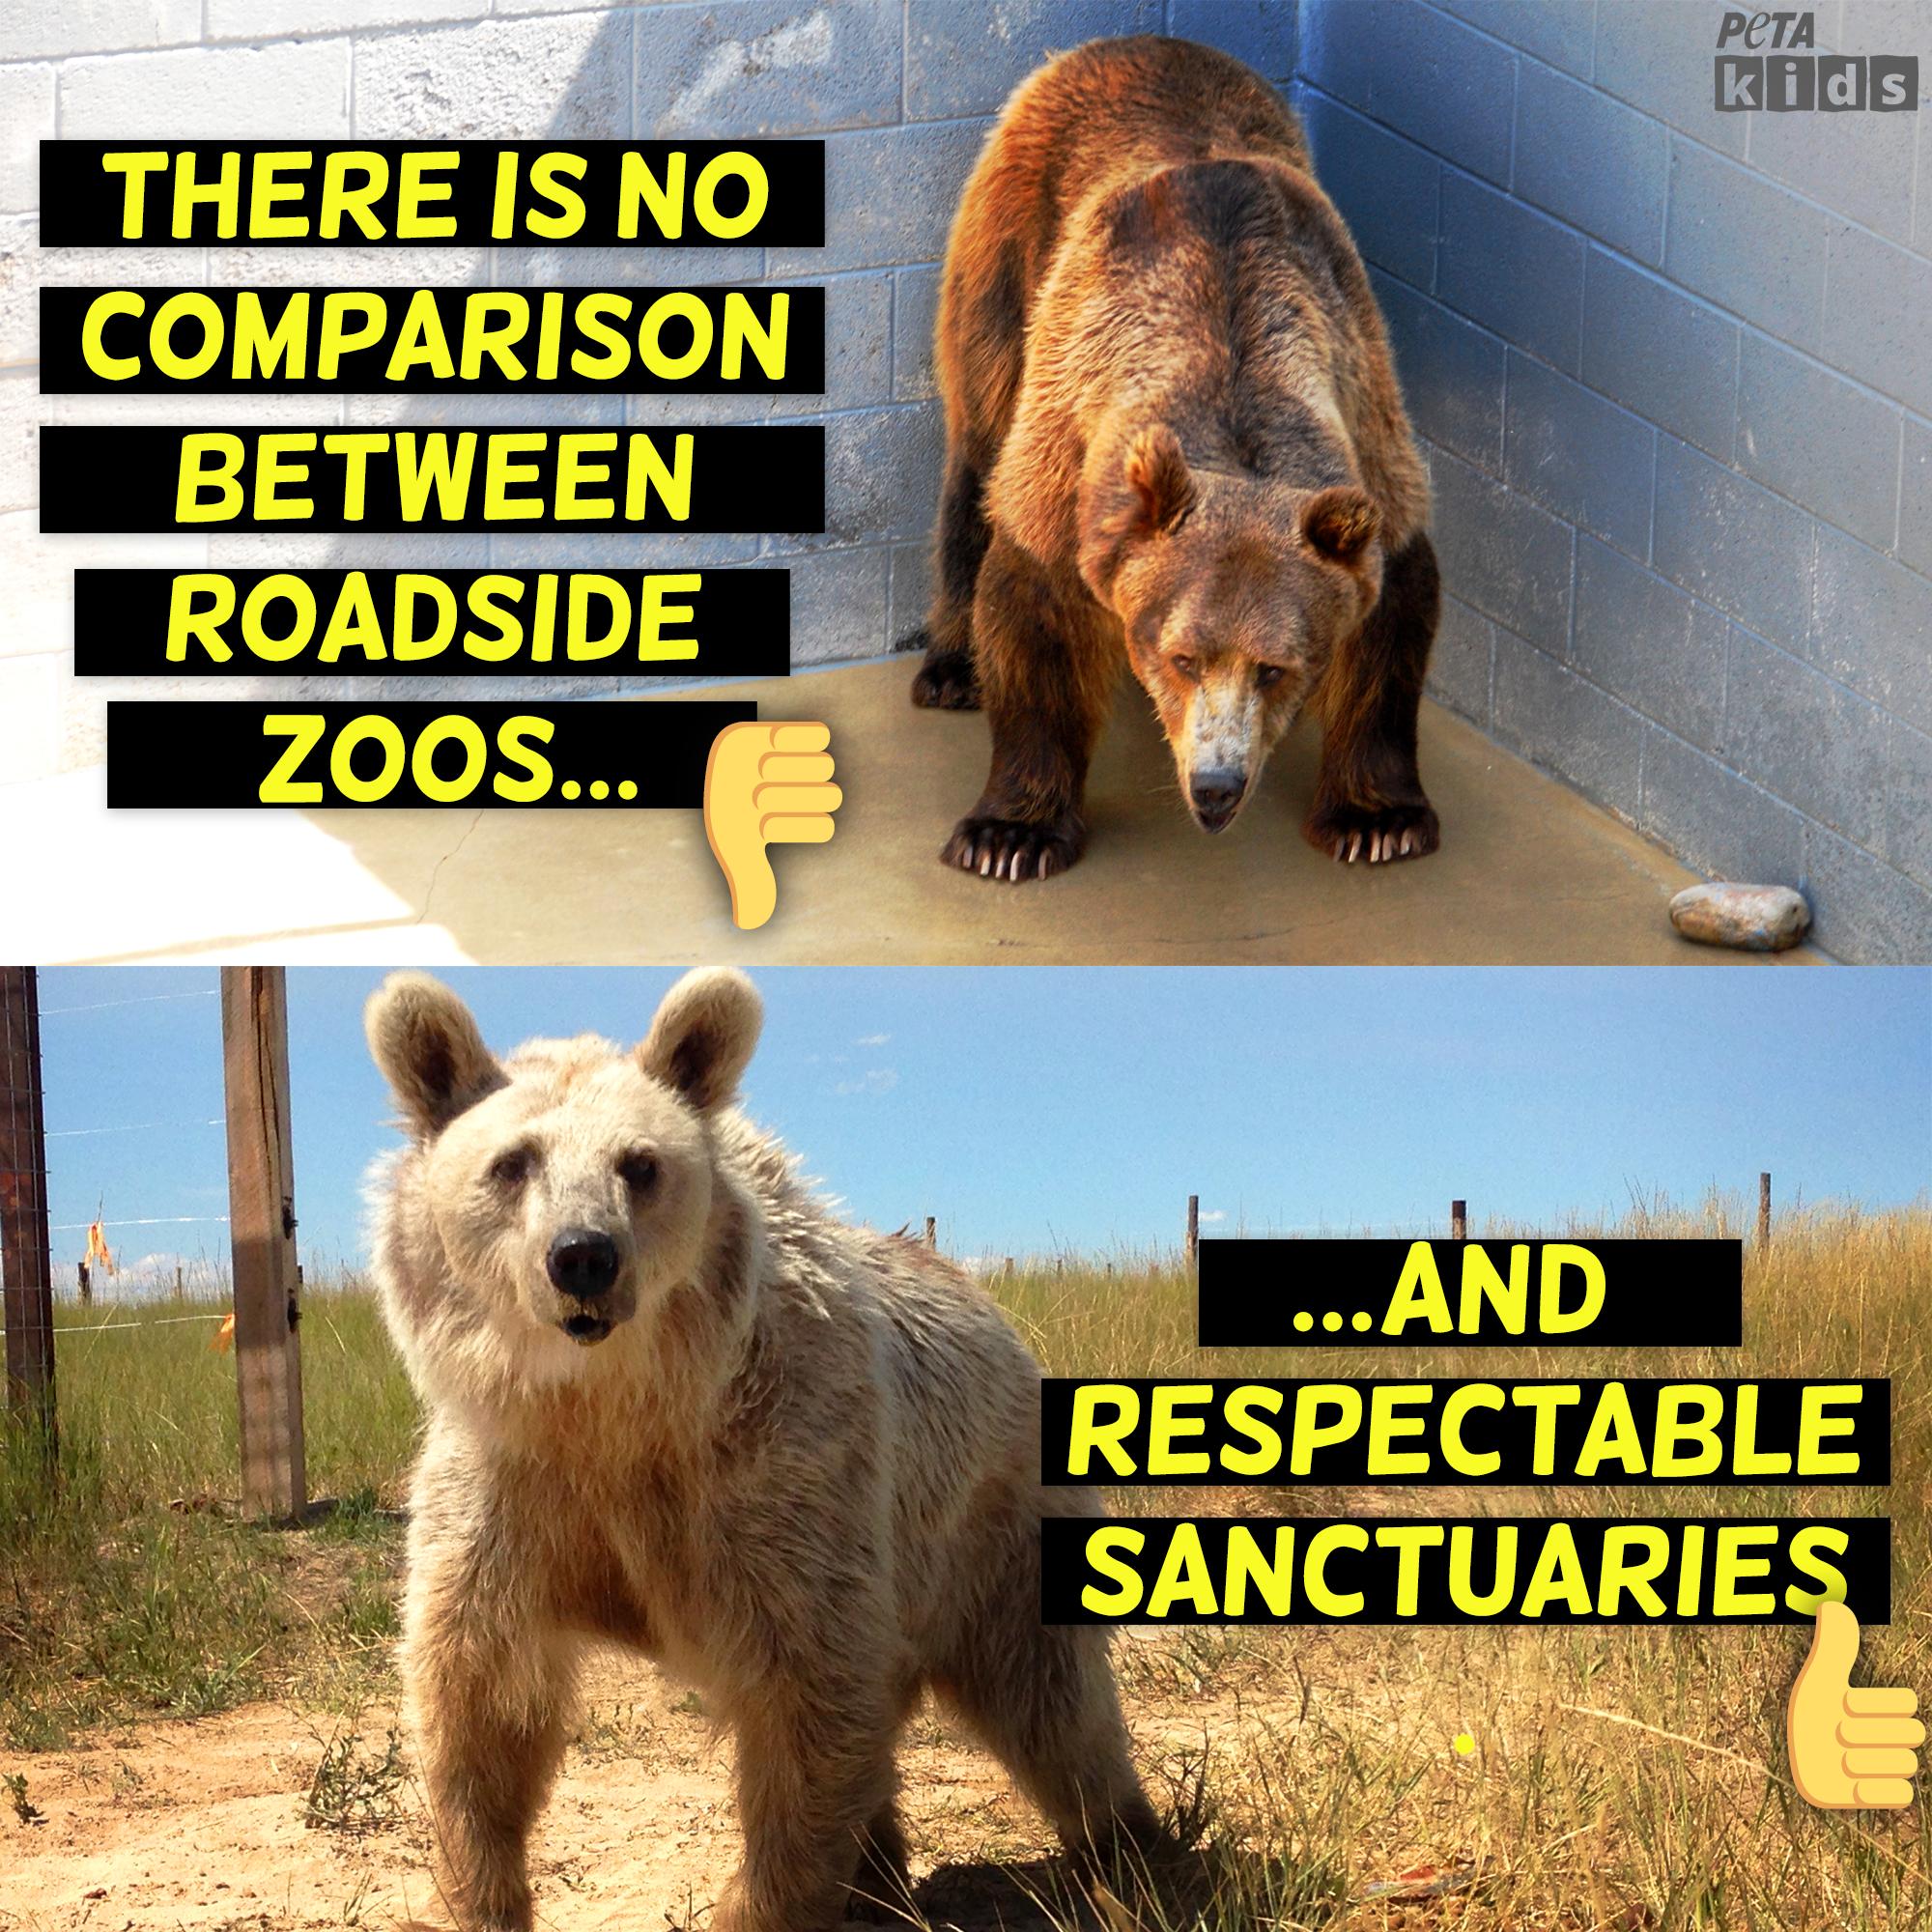 Roadside zoo vs. Animal Sanctuary